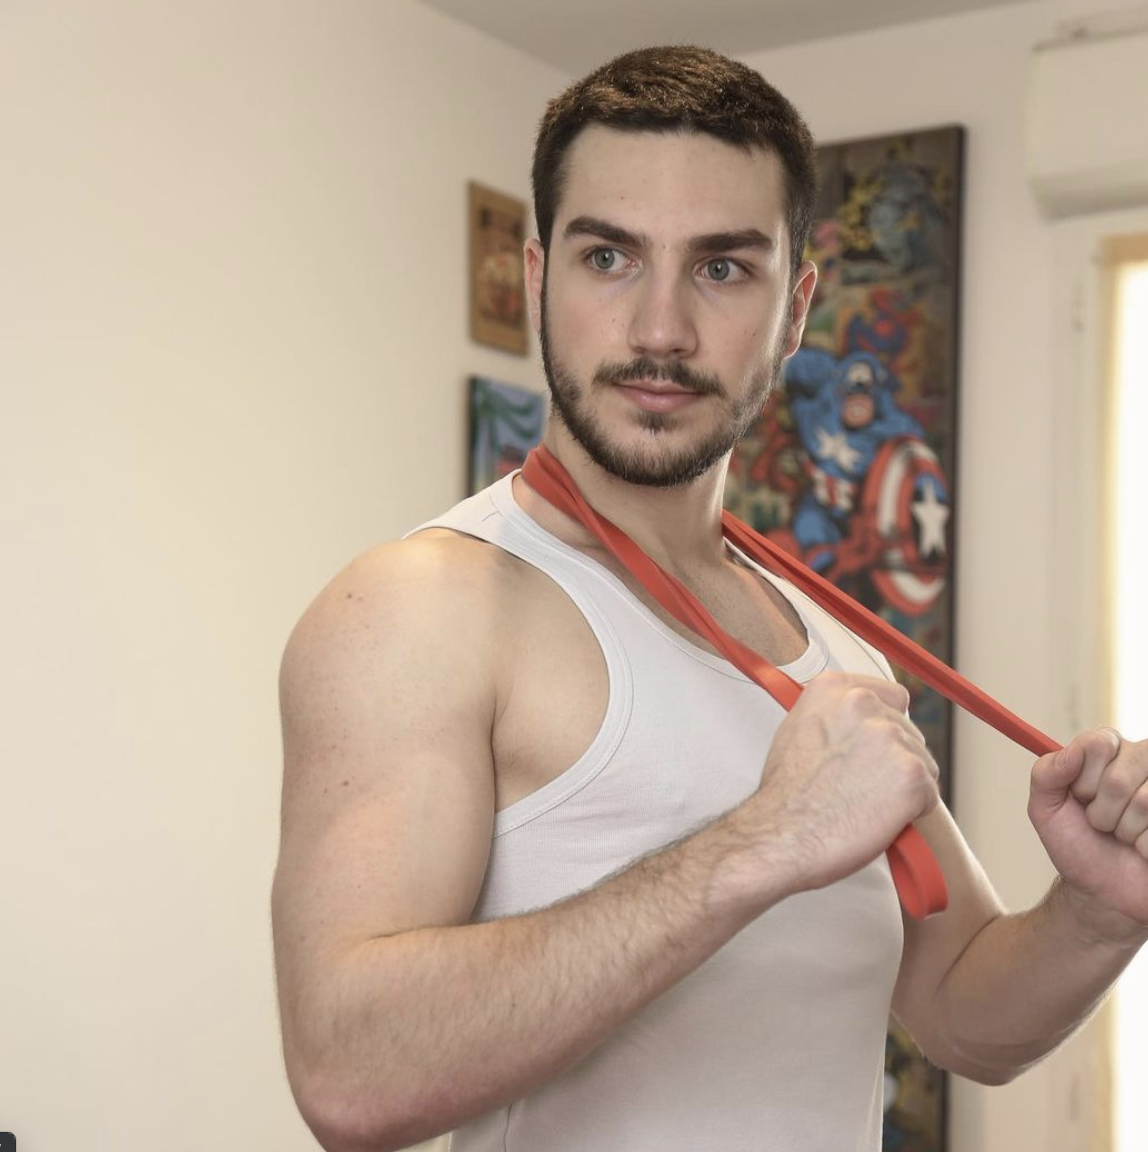 Cedric fitness